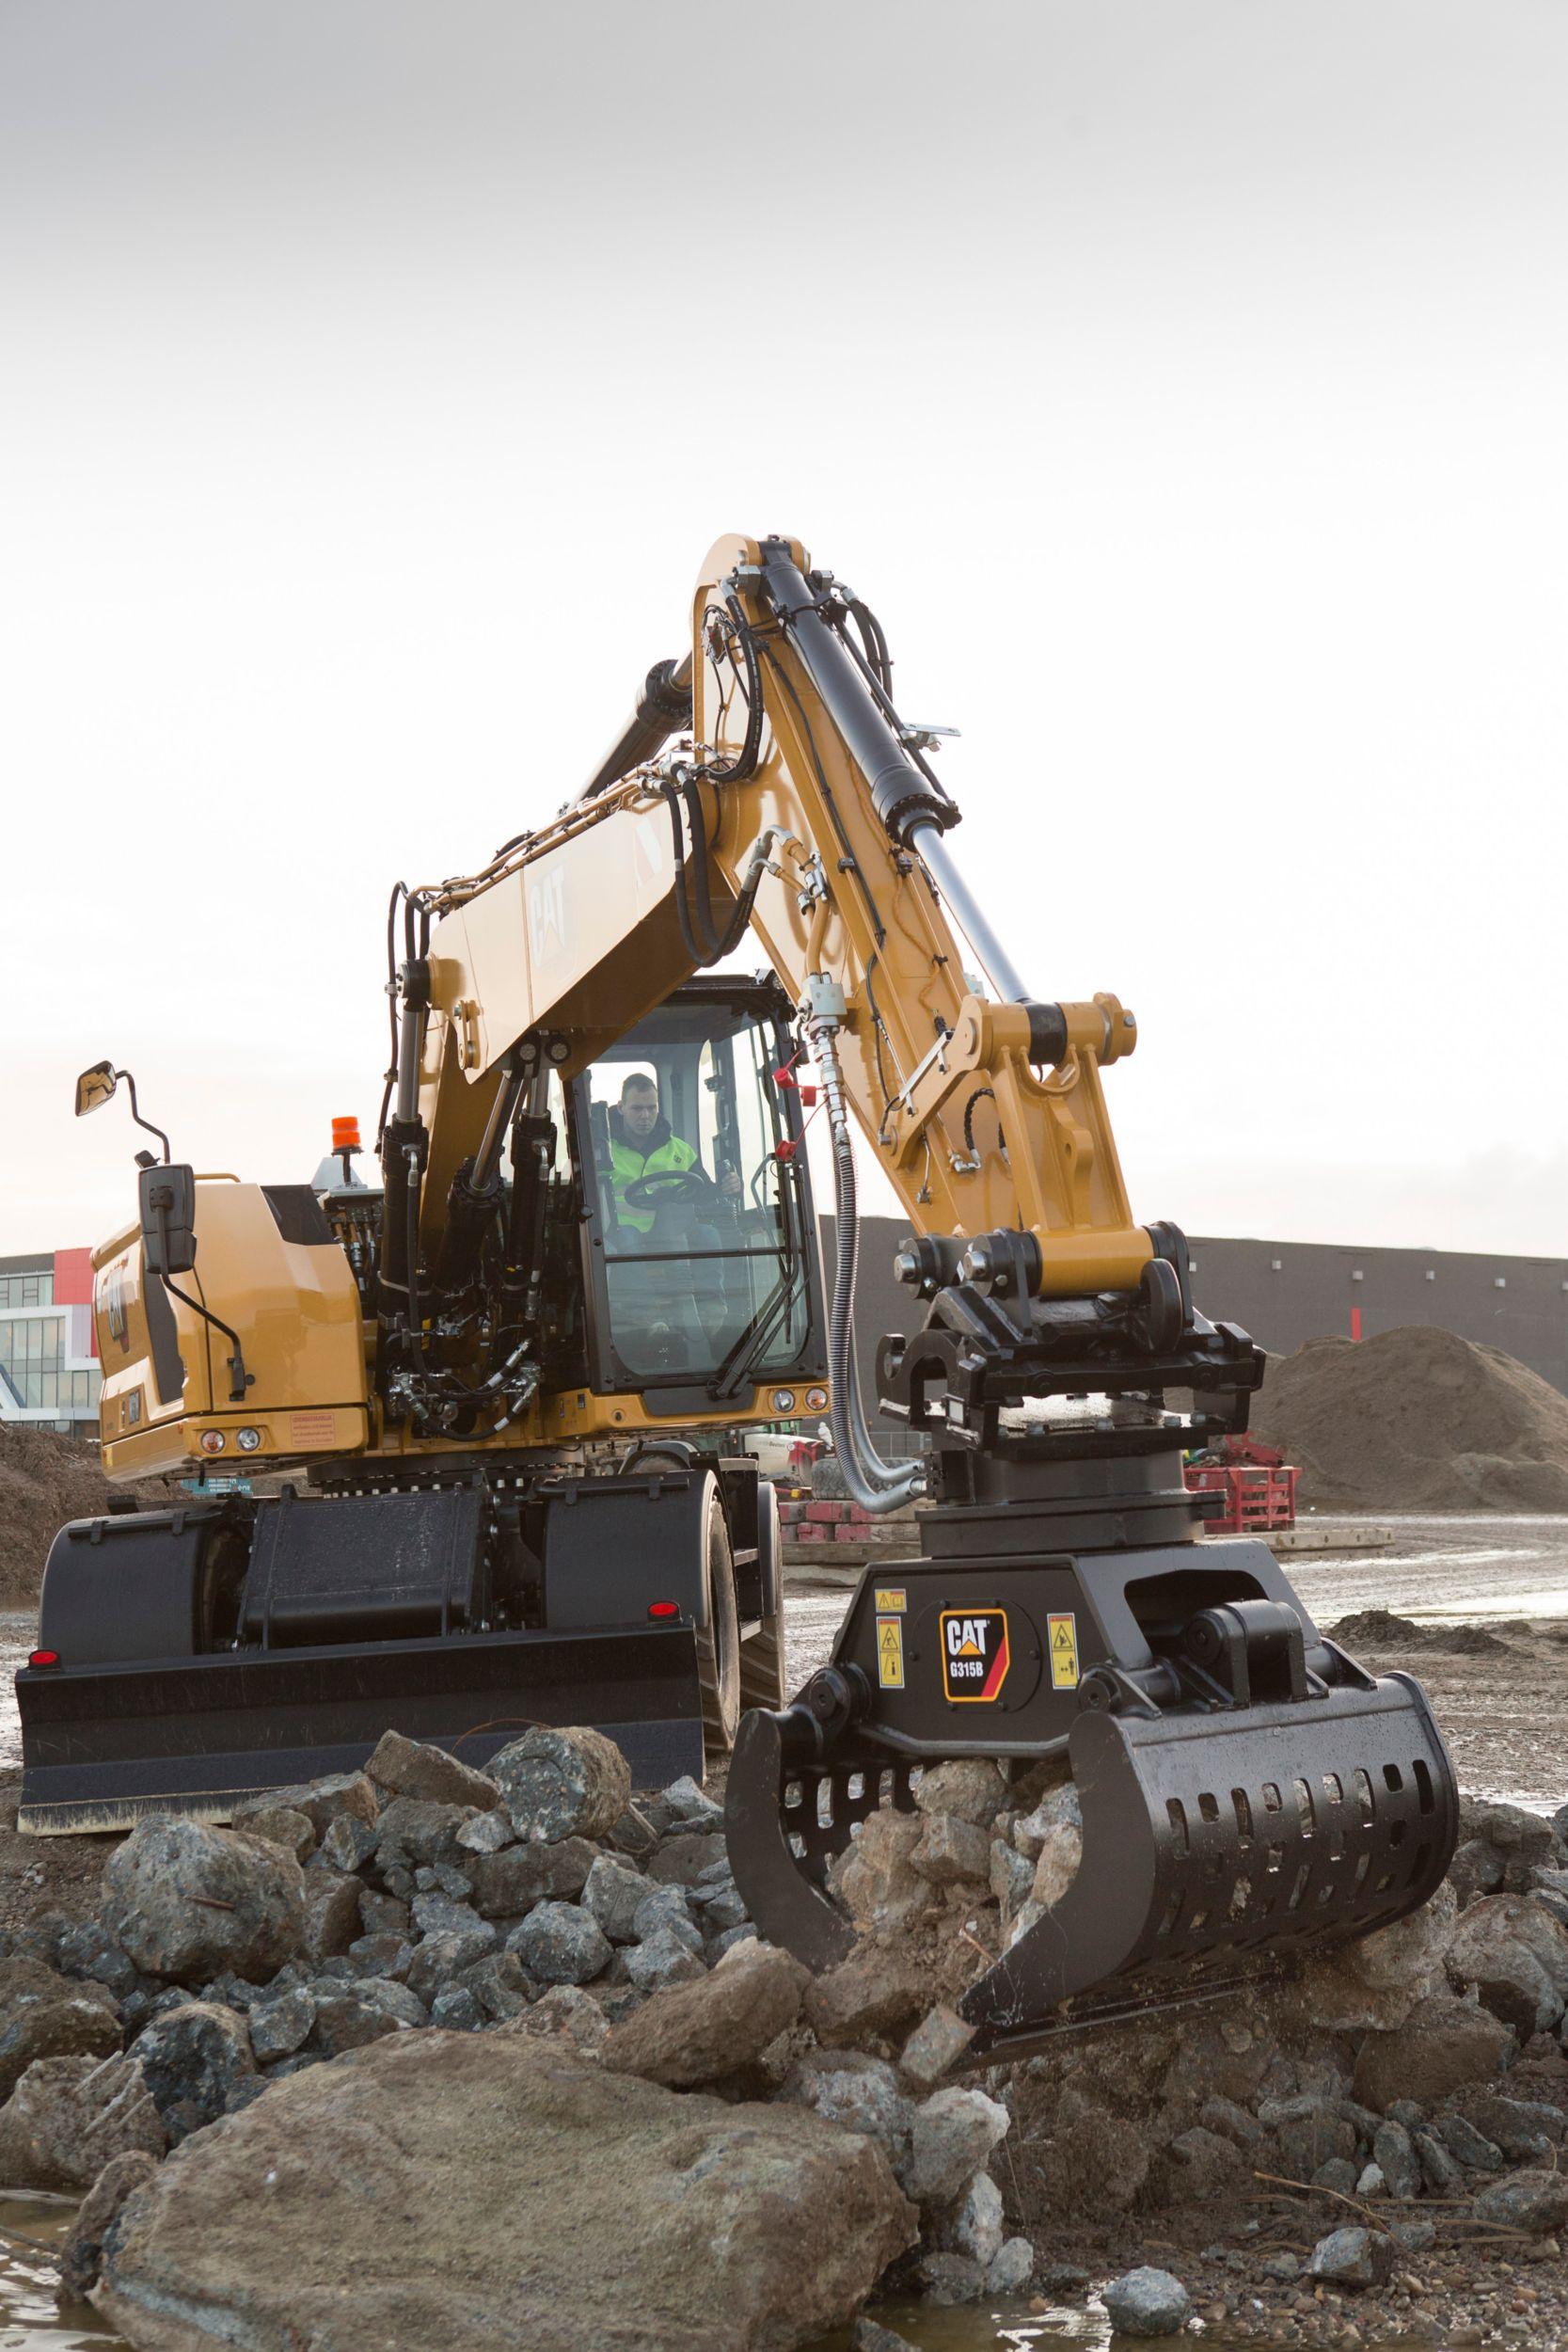 M318 Wheeled Excavator